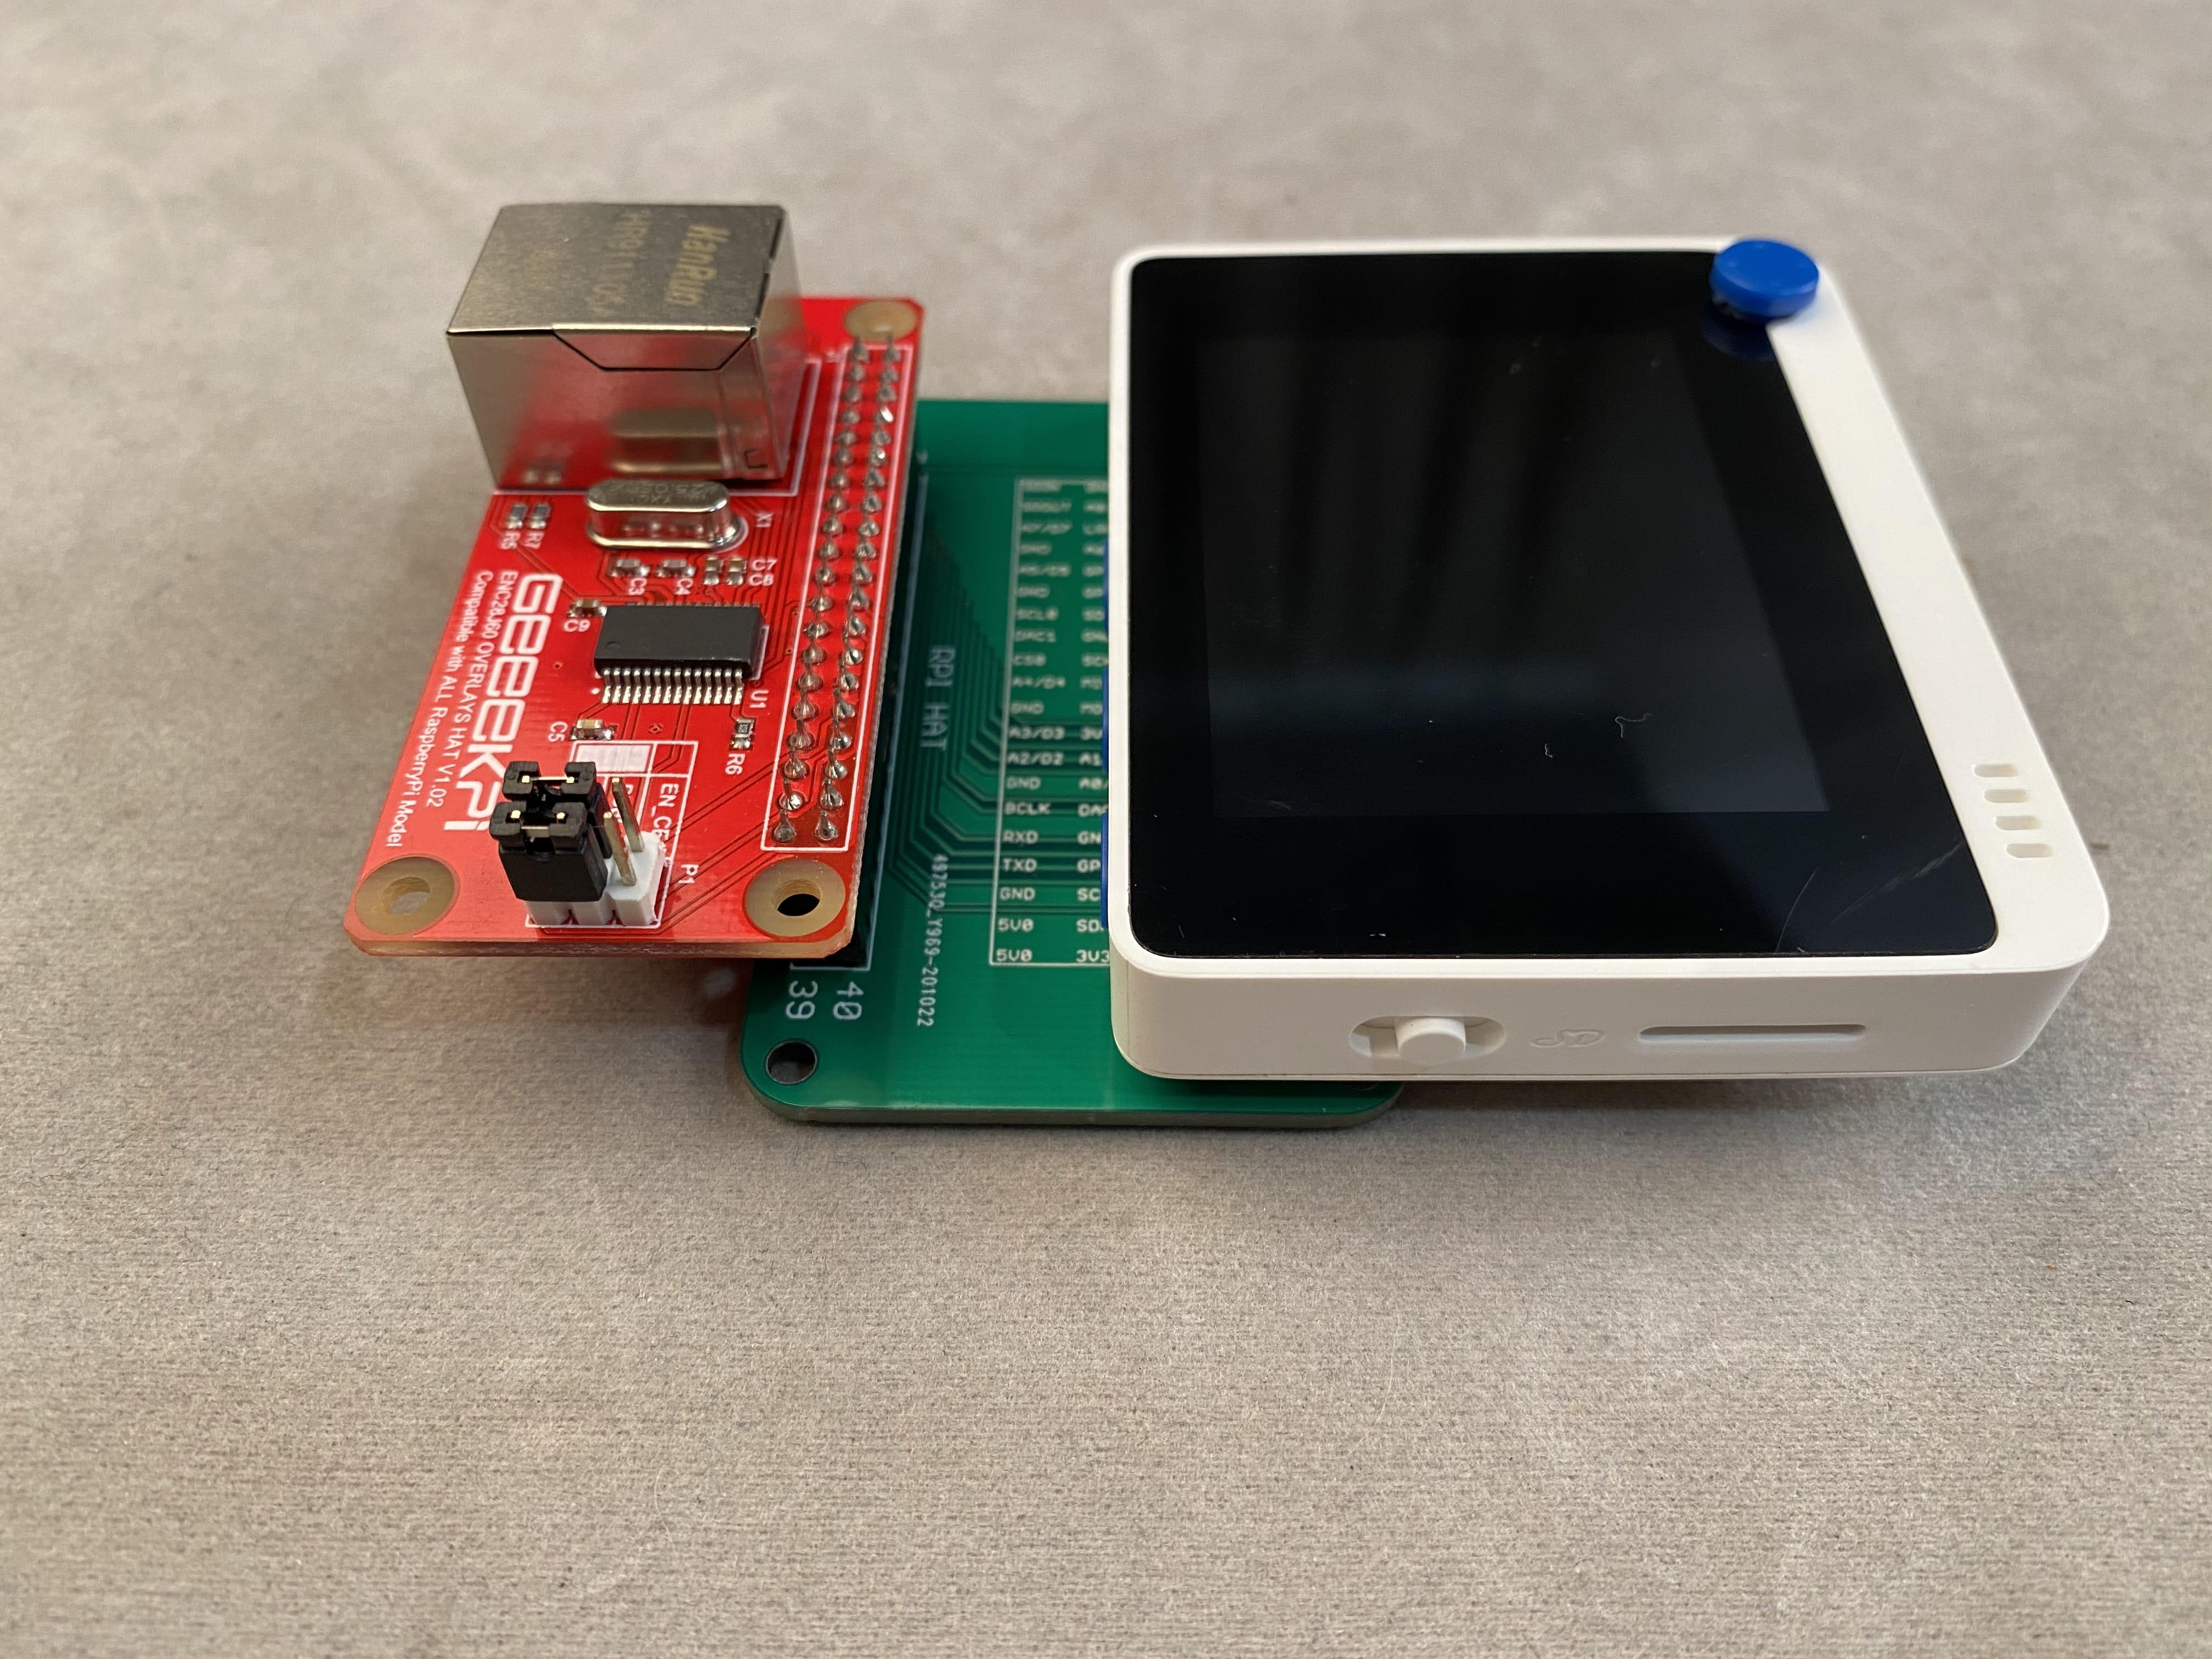 Wio Terminal</a> to use Raspberry Pi's Pi Hats